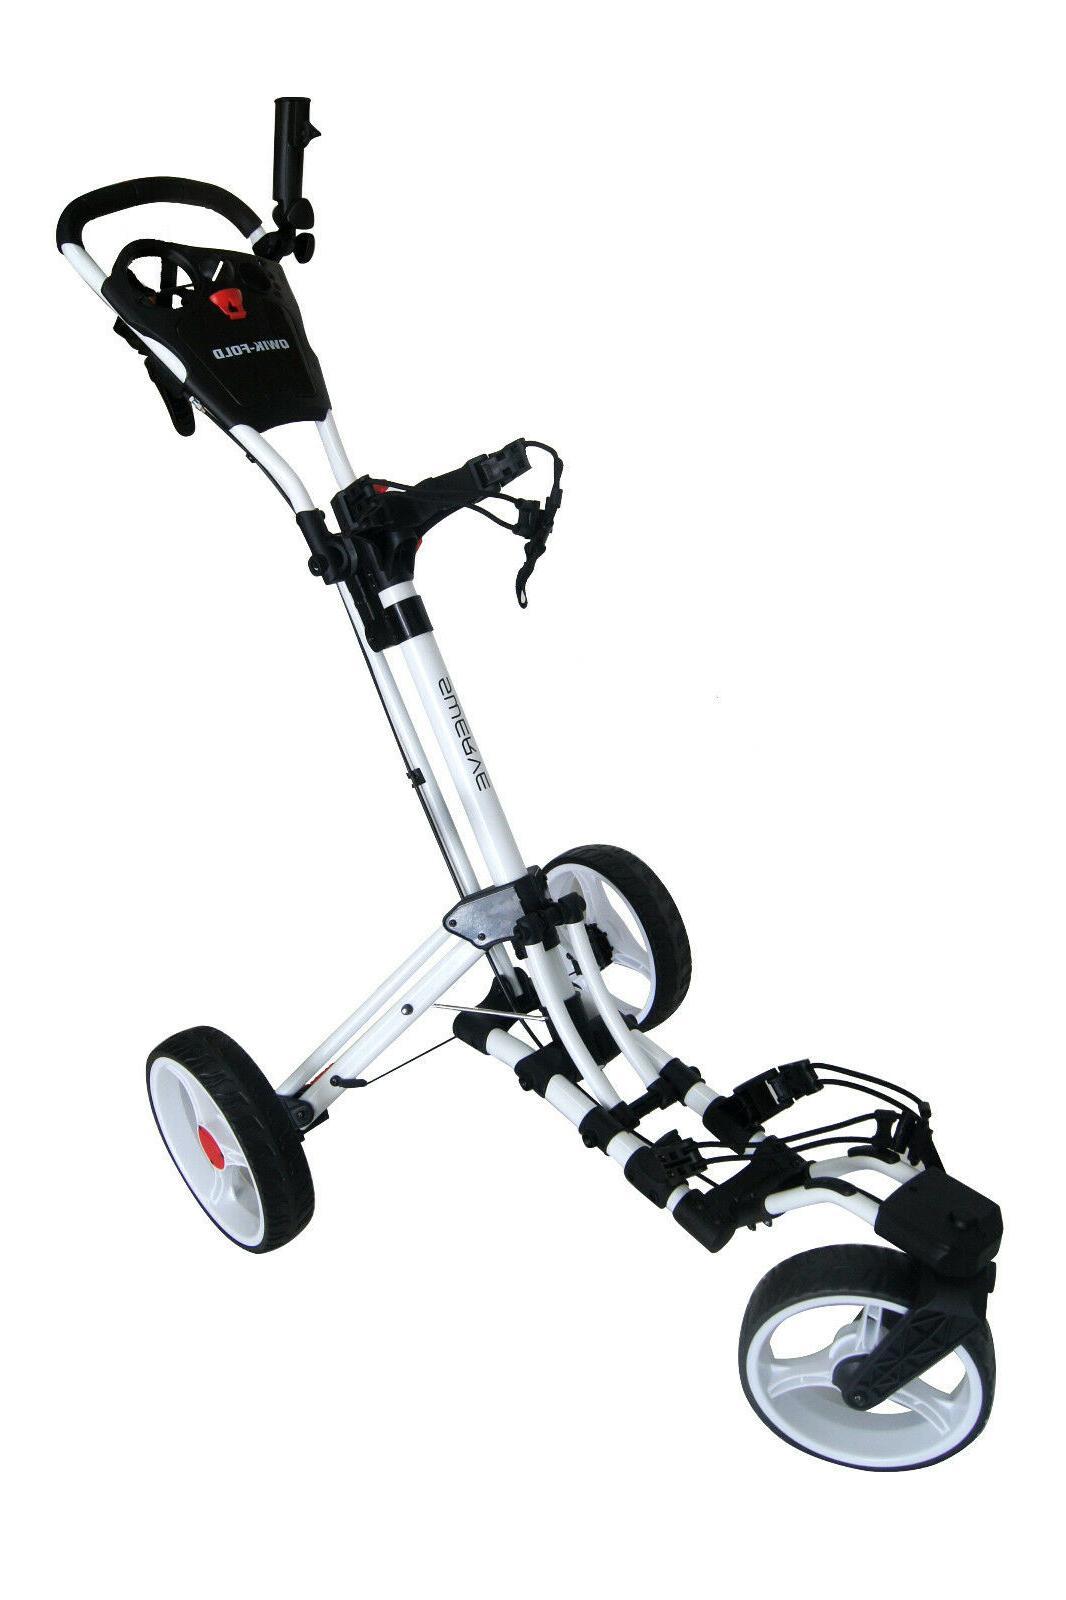 Founders Club Qwik Swerve 360 3 Wheel Pull Cart Trolley